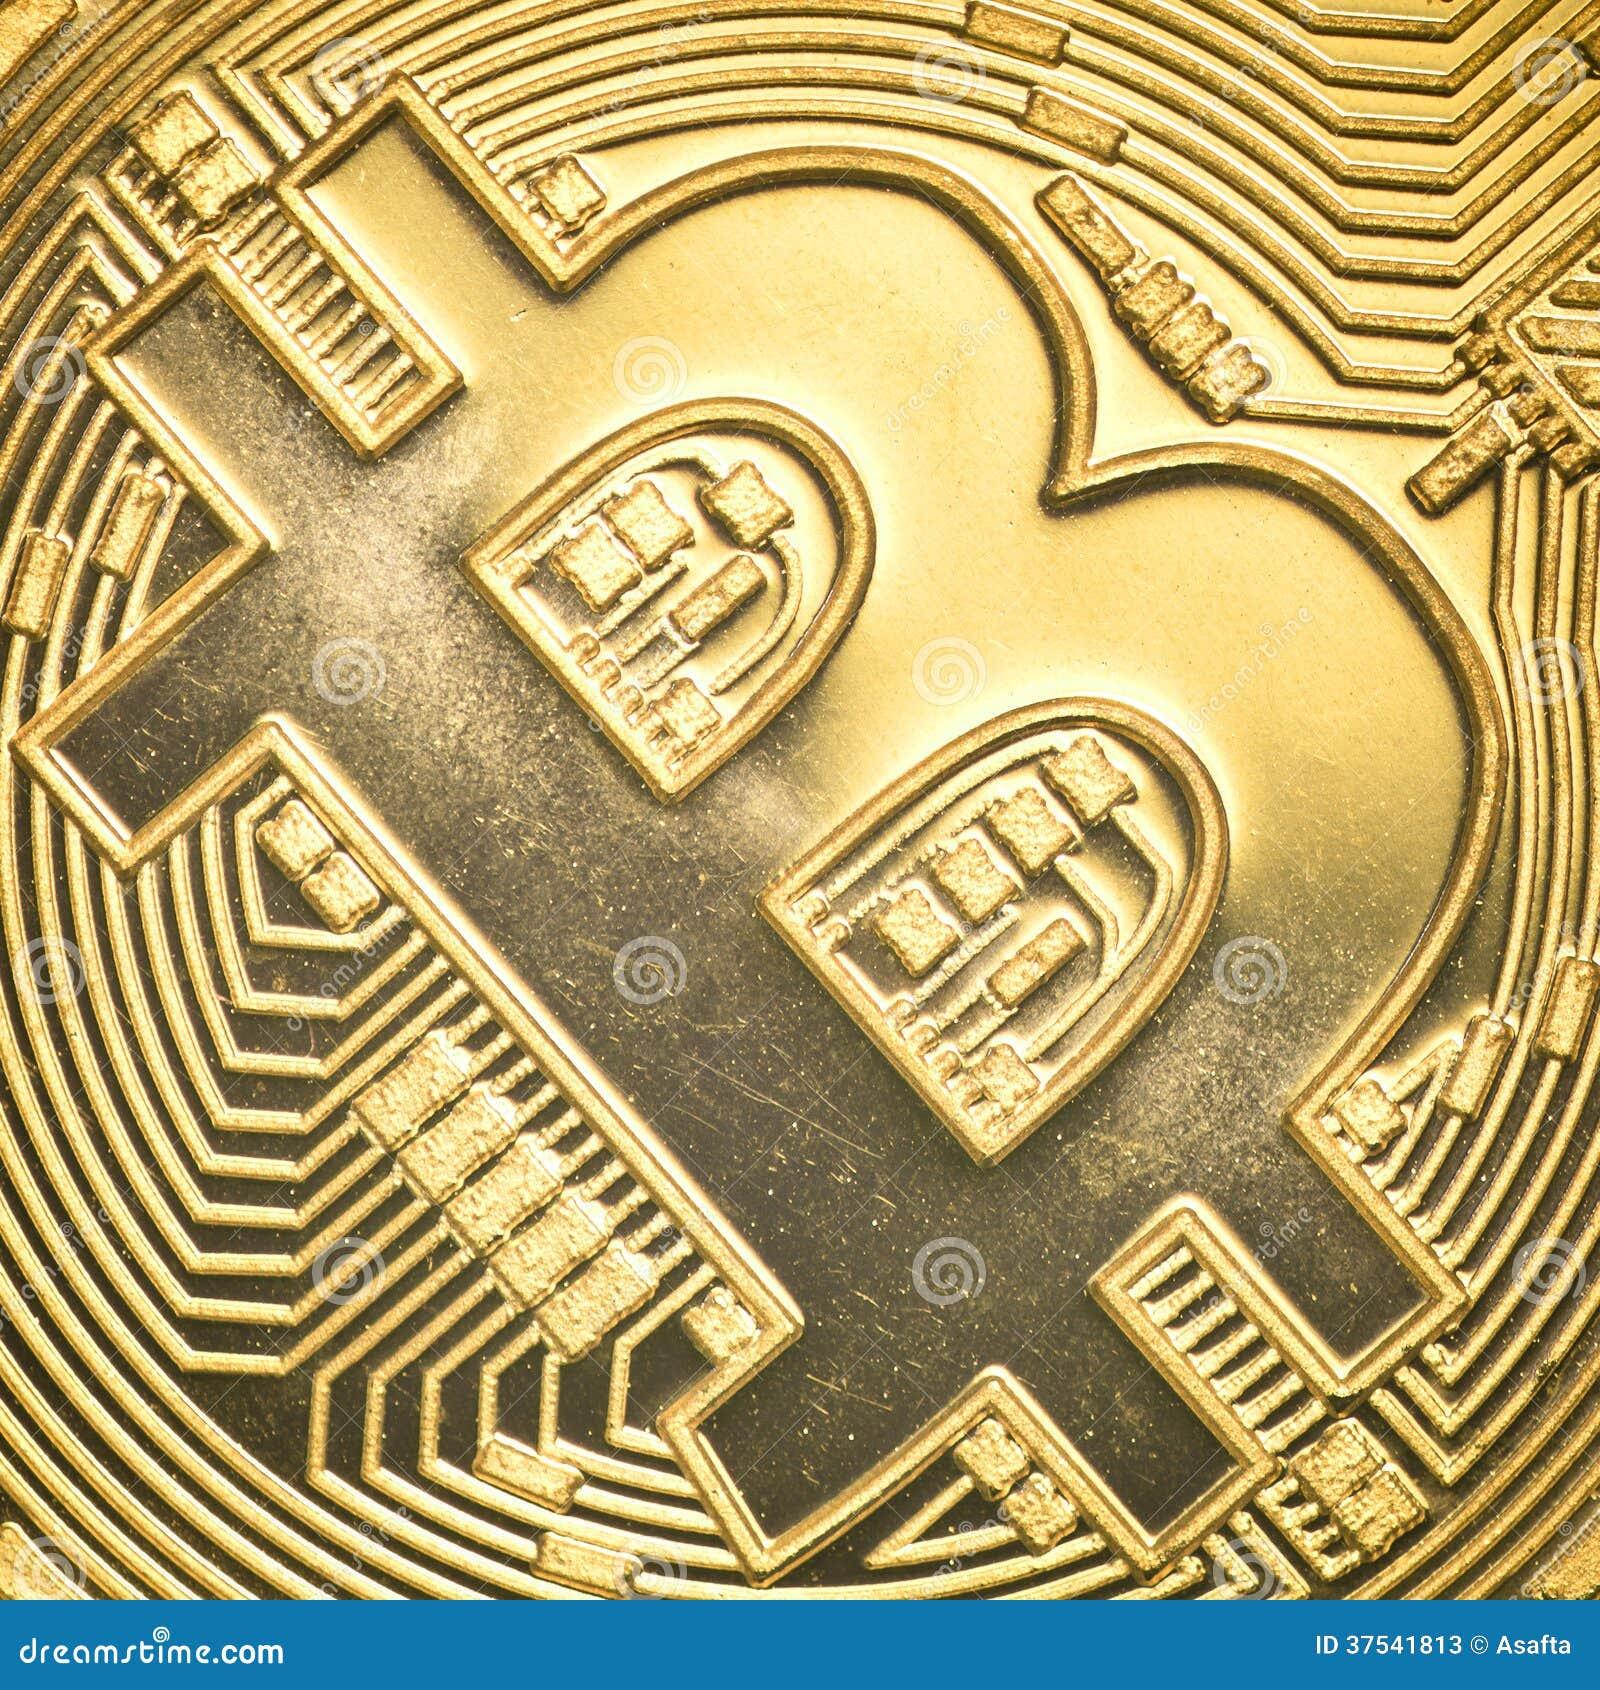 bitcoin chart bloomberg